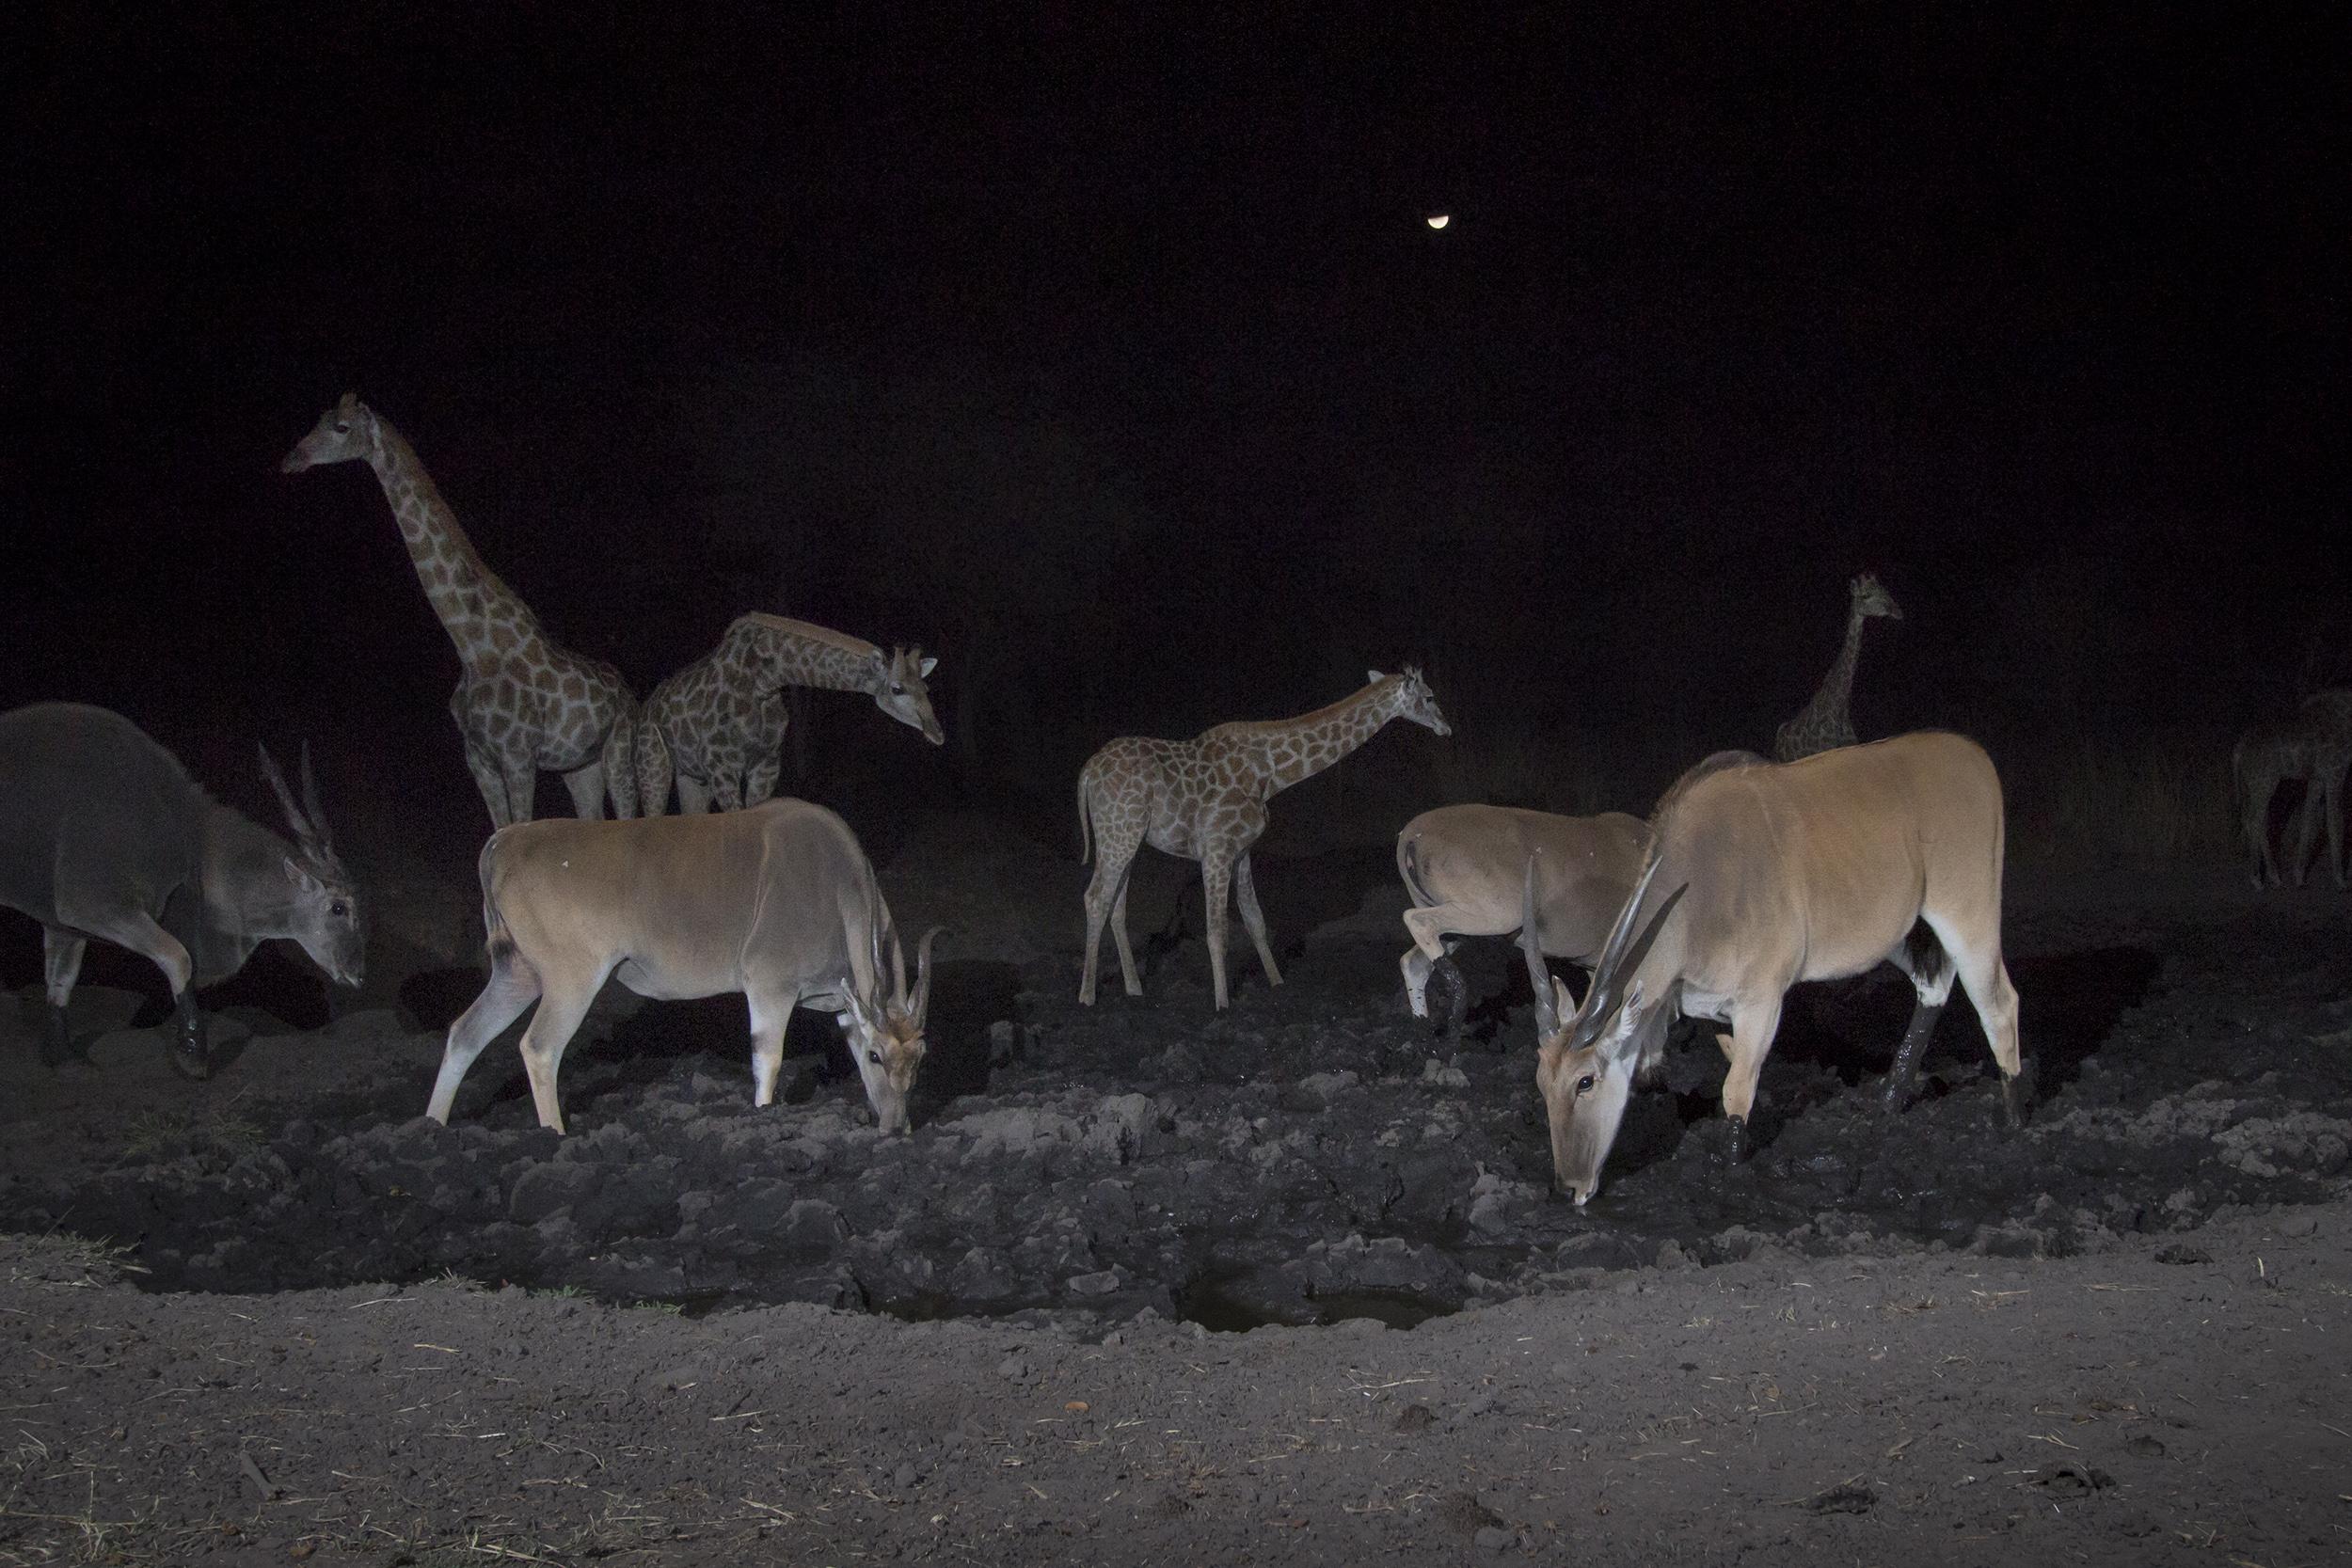 A camera trap image of elands and giraffes using Camtraptions PIR motion sensor.